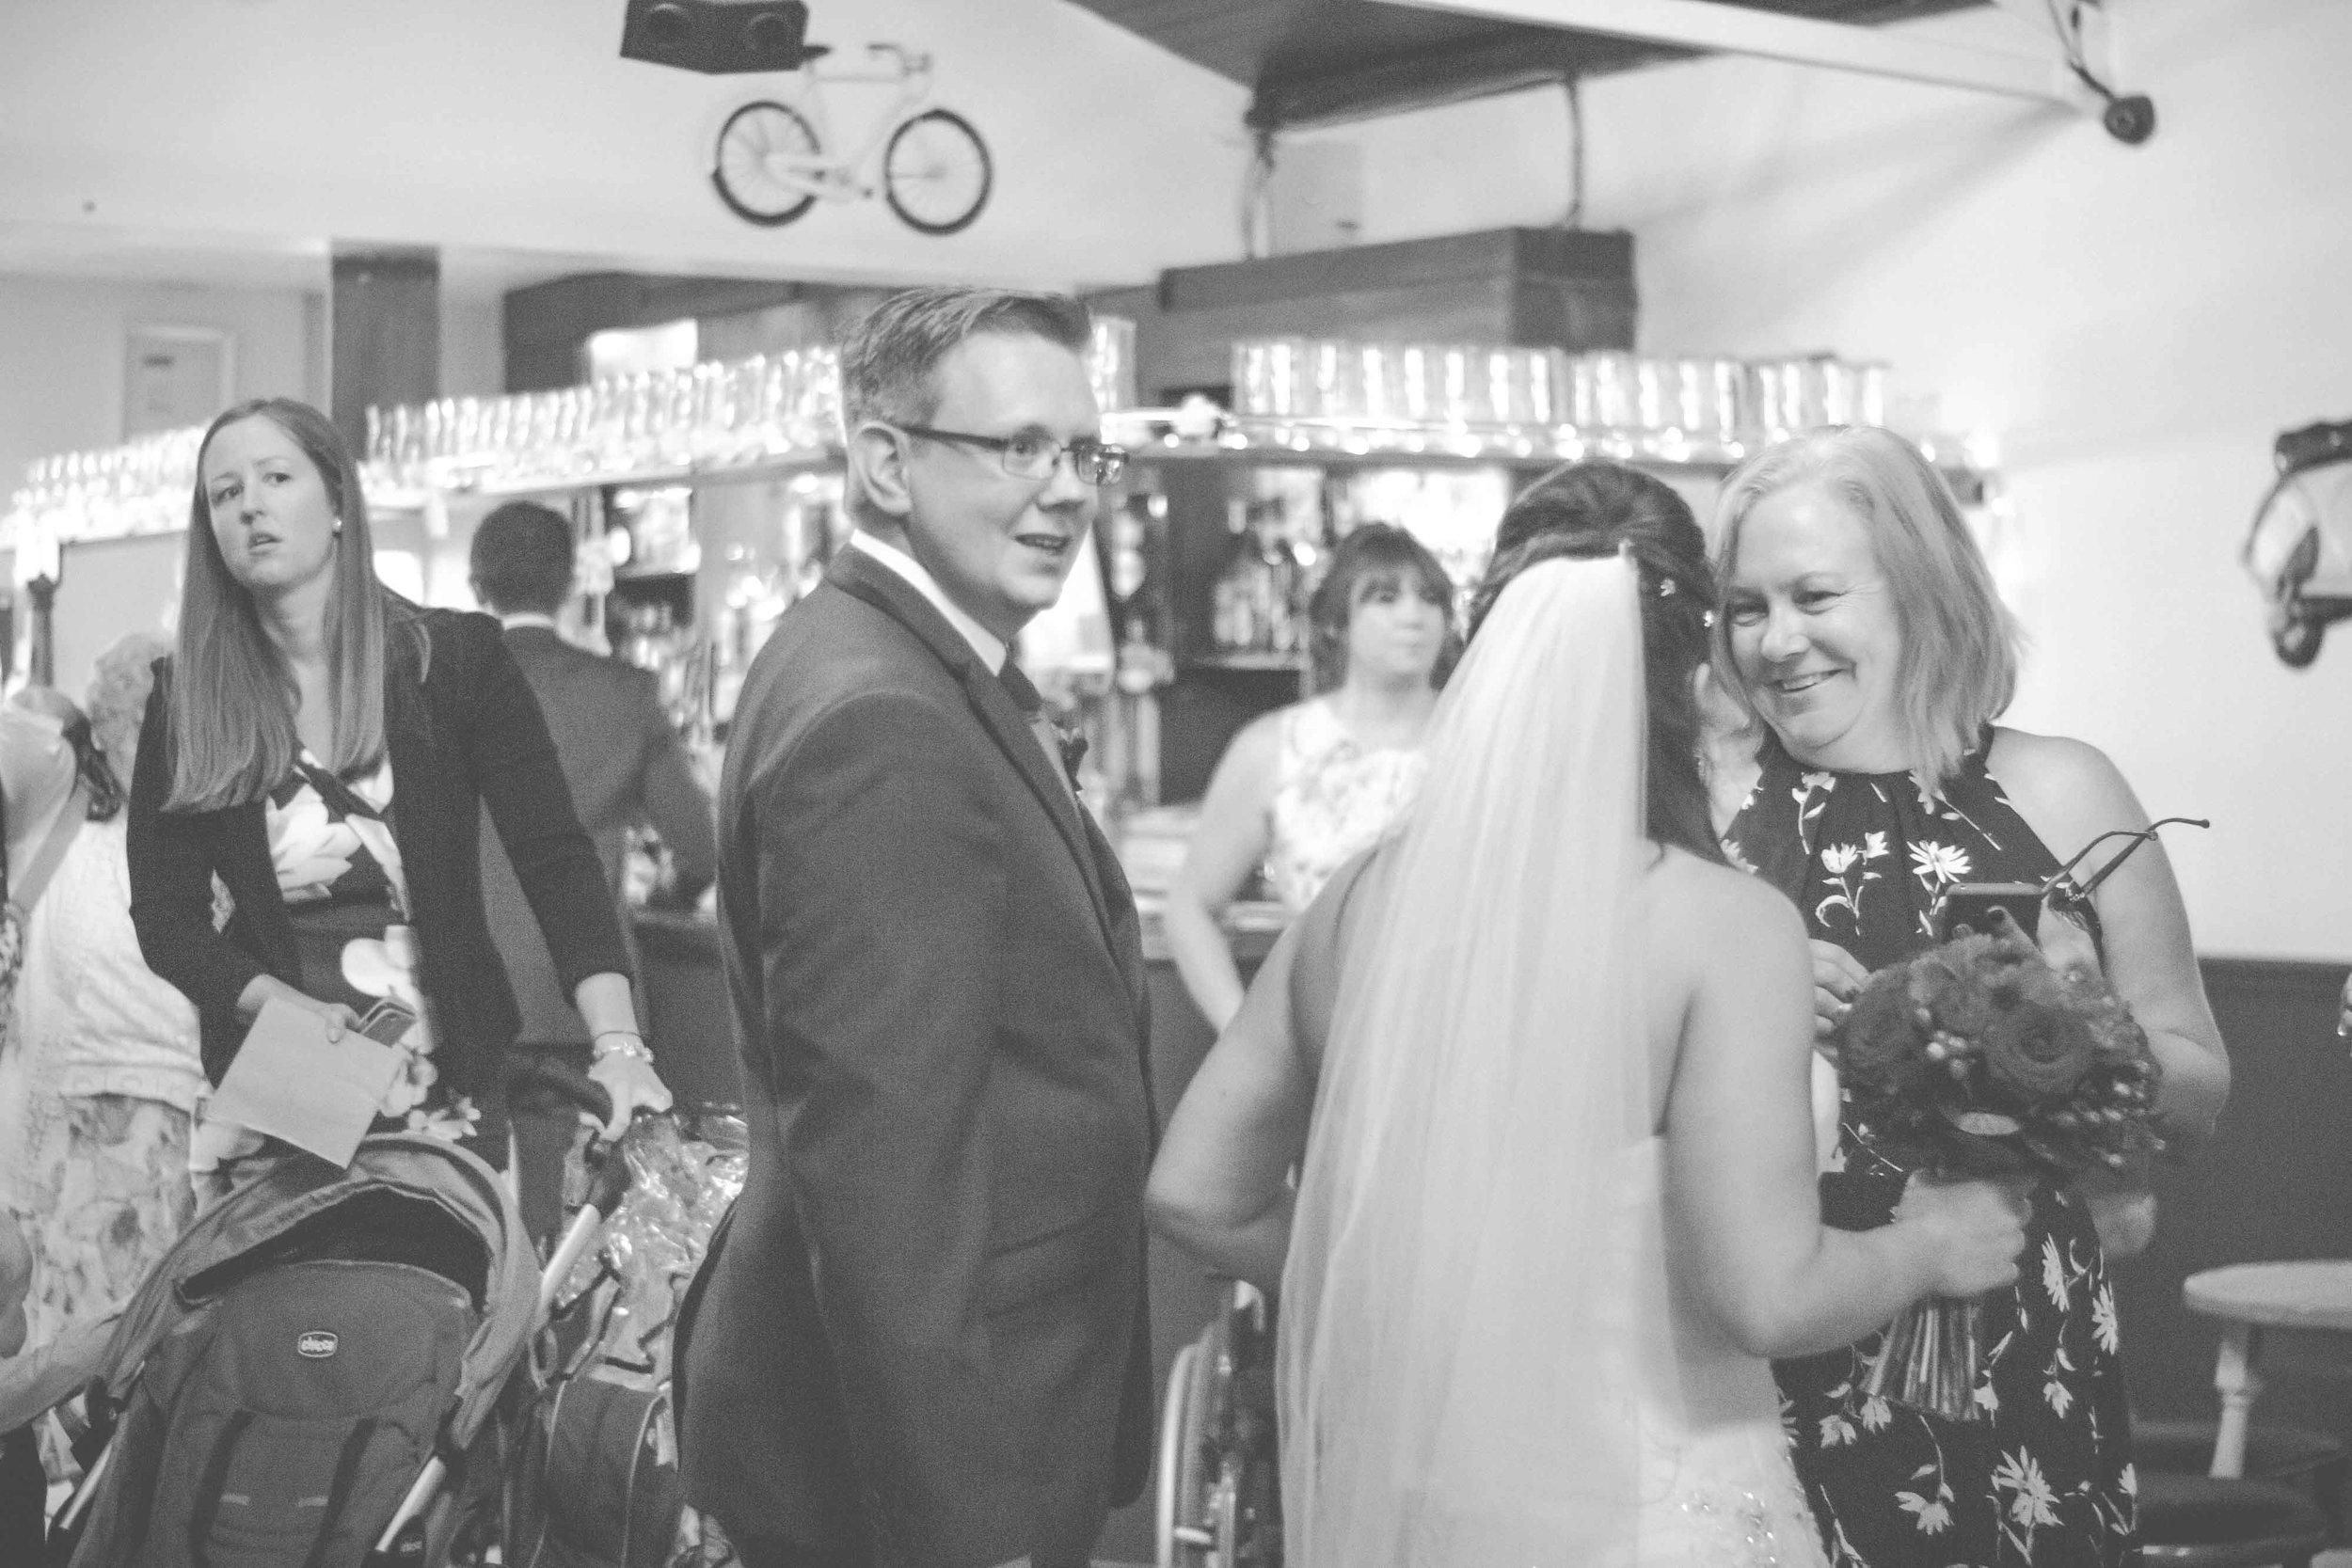 st-johns-ingrow-keighley-wedding-photos-29